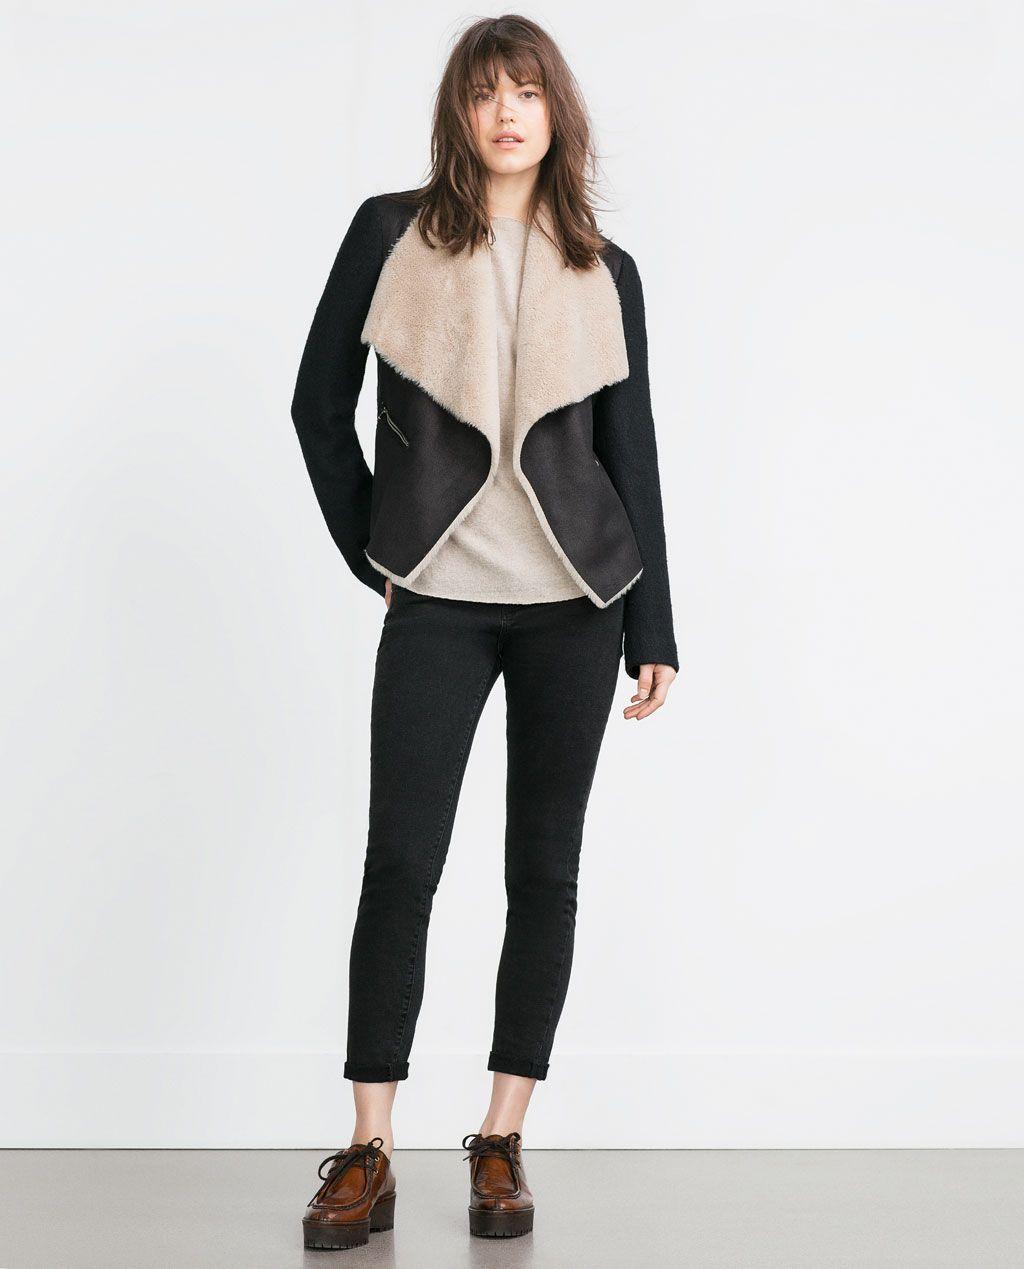 Image 1 De Veste En Imitation Peau Lainee De Zara Look Jackets